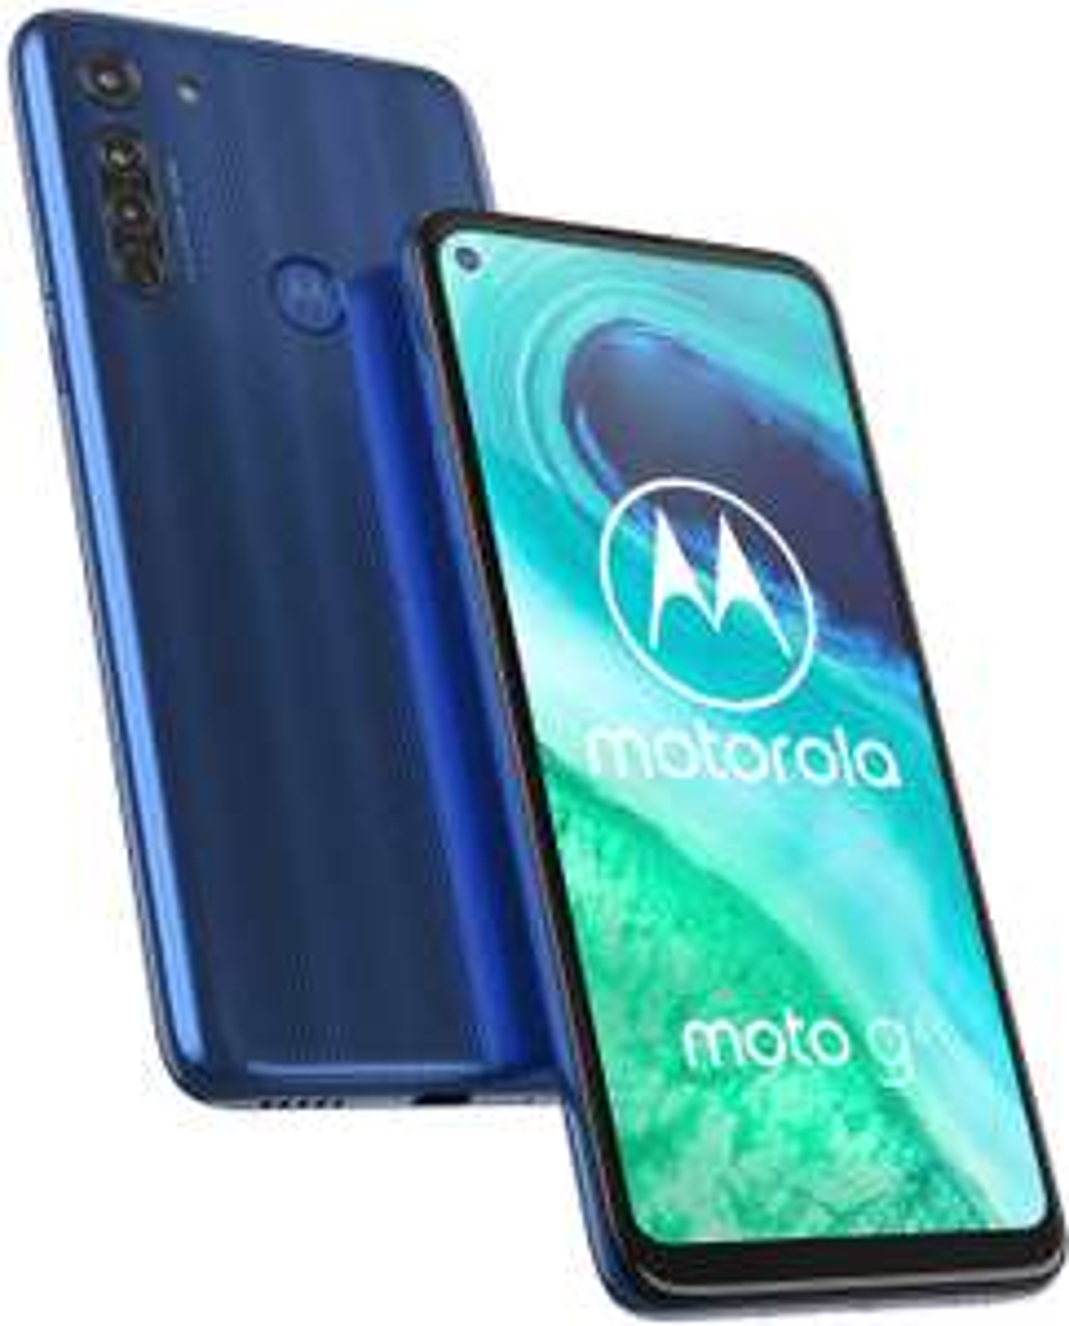 "Motorola Moto G8 6.4"" Smartphone 64GB, 4GB RAM, Dual Sim, Neon Blue 4000mah, Android 10 - £127.53 delivered @ Amazon"